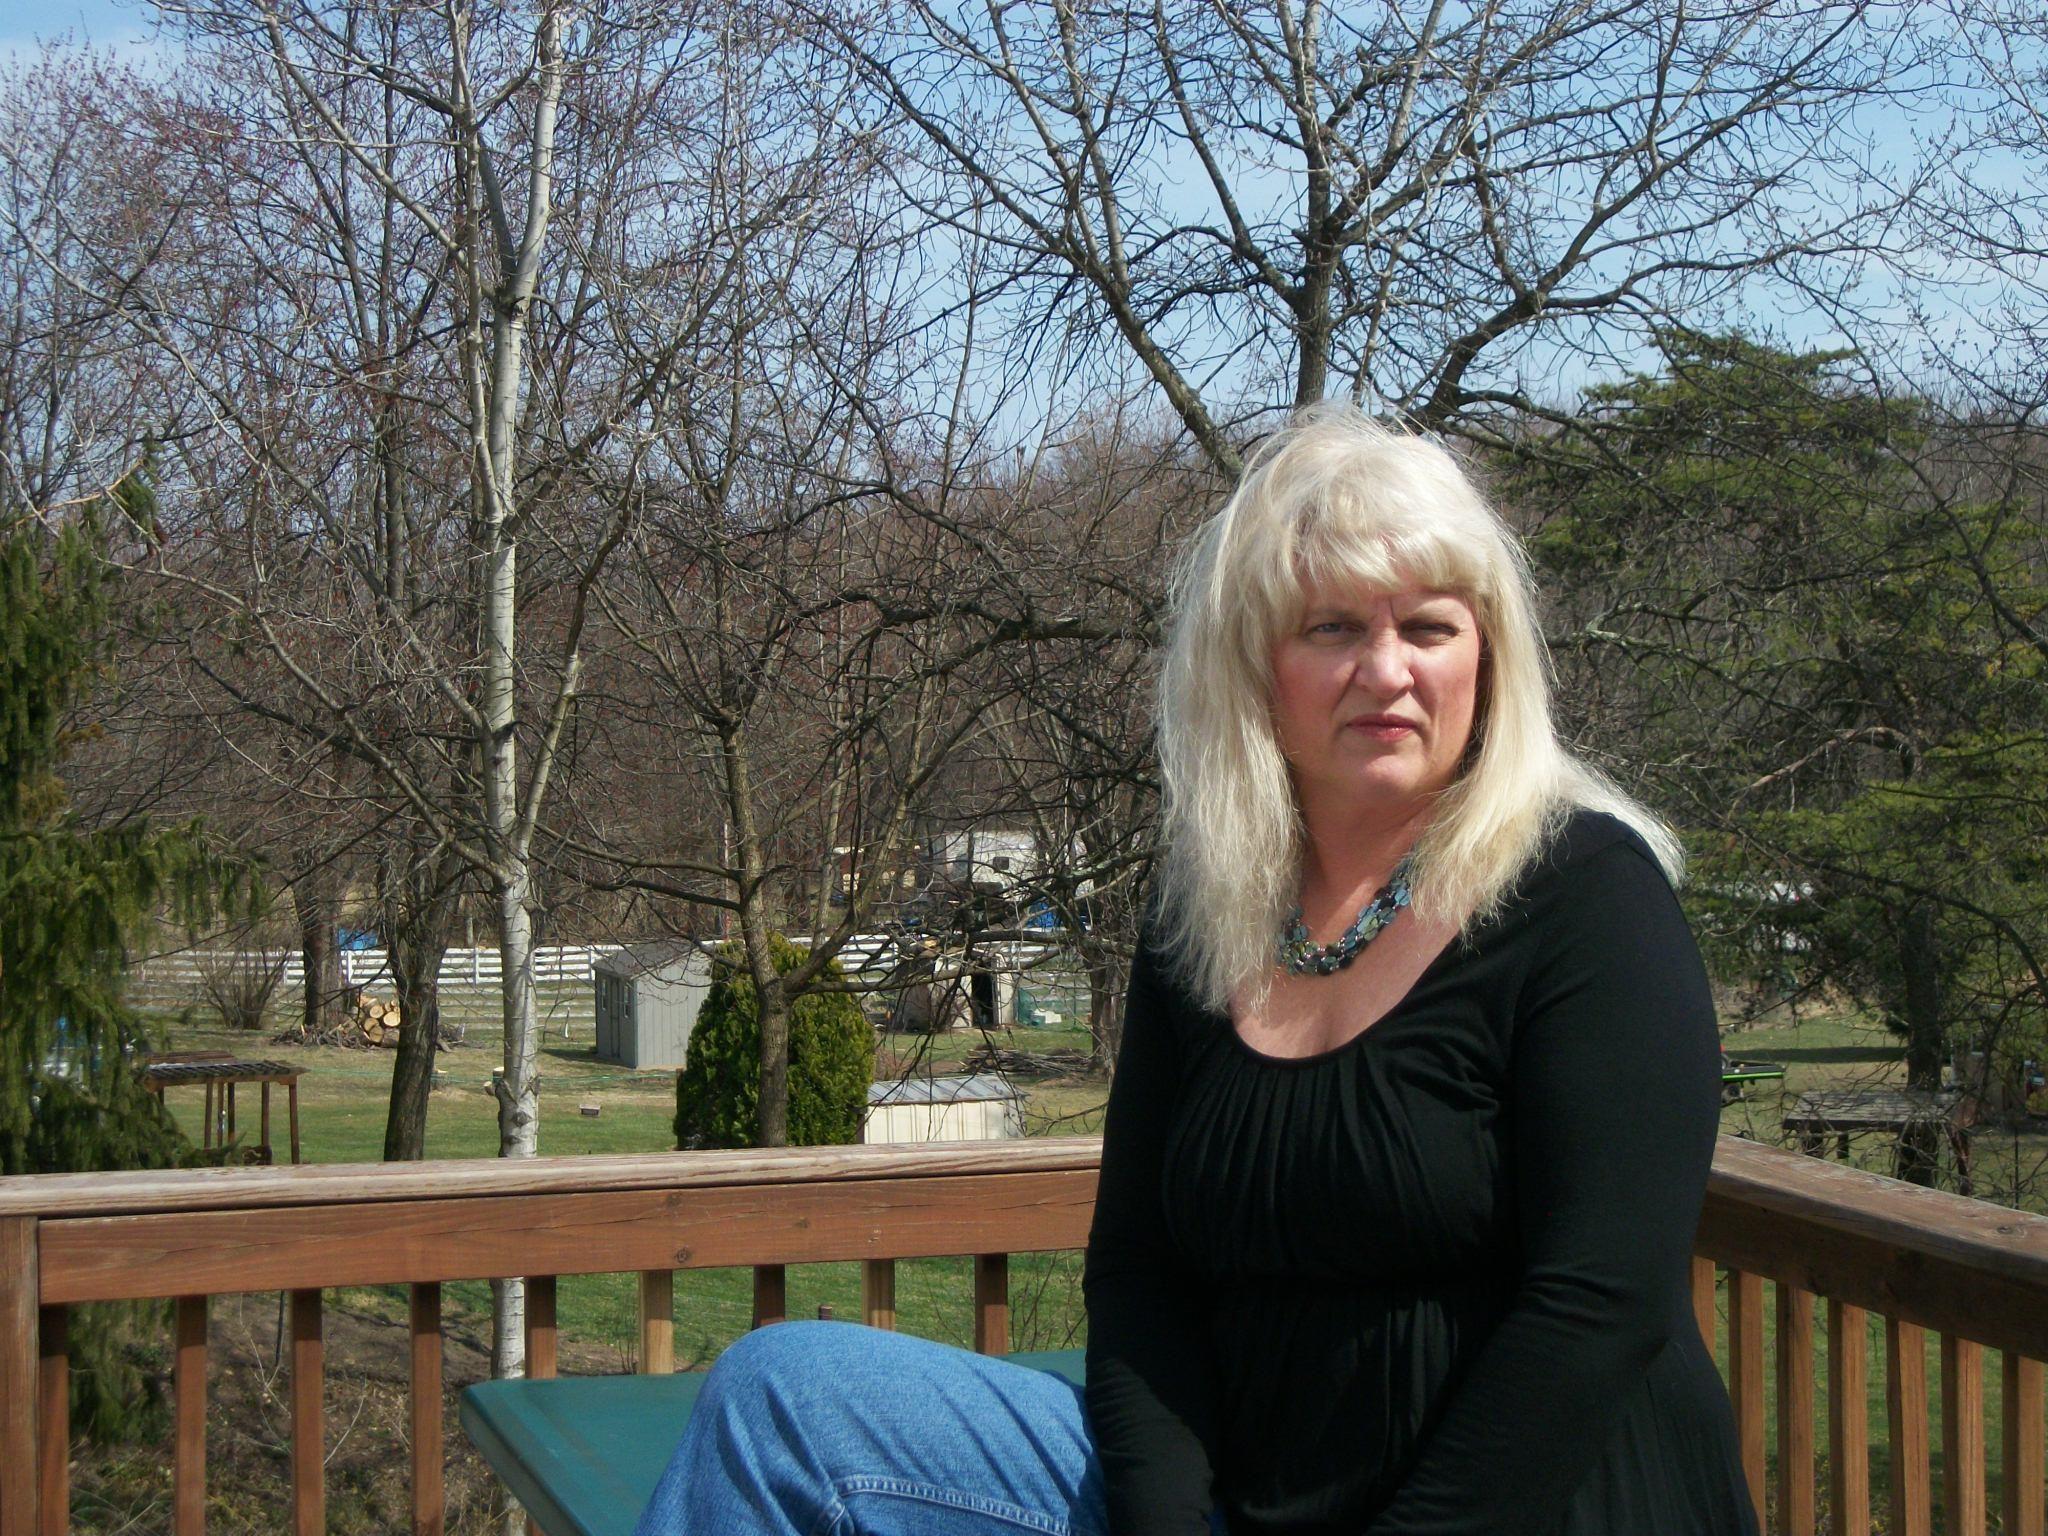 Singles in lancaster pennsylvania Pennsylvania - Christian Singles Groups - PA